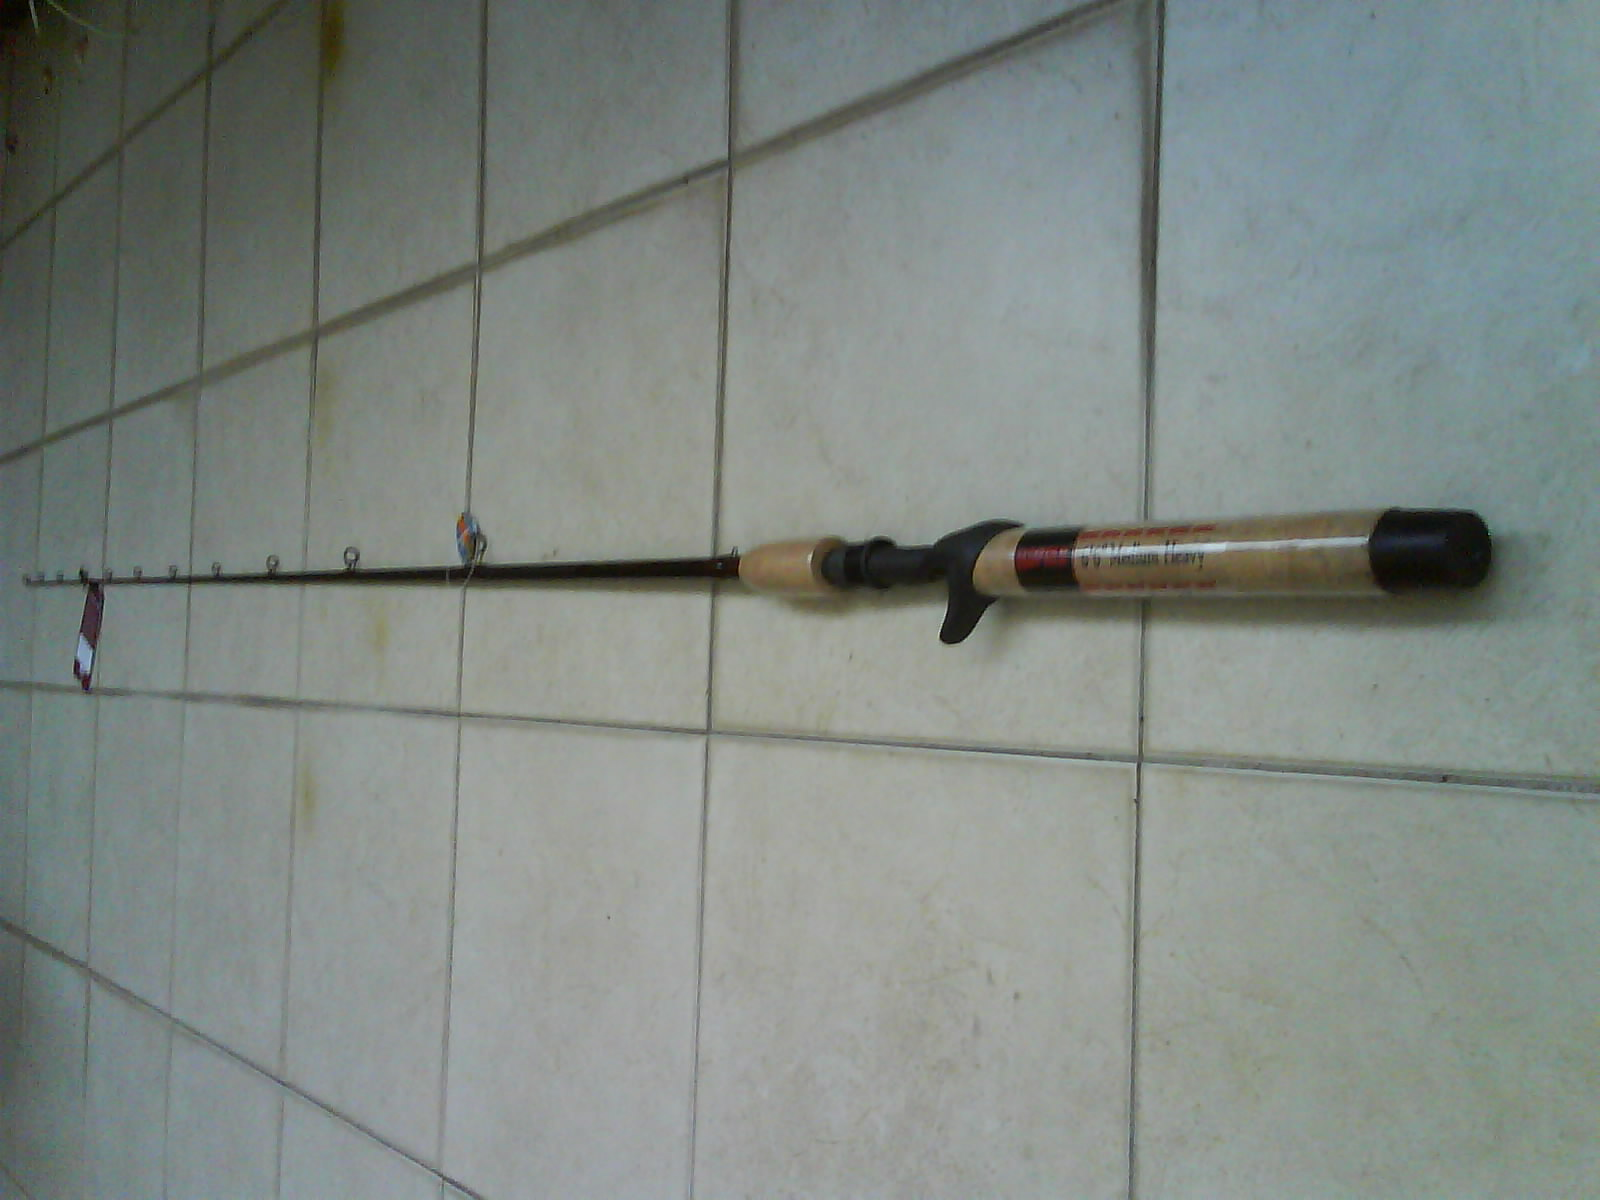 Mecangkuk rapala baitcaster fishing rod 1 piece 6 39 6 8 for Baitcaster fishing rod